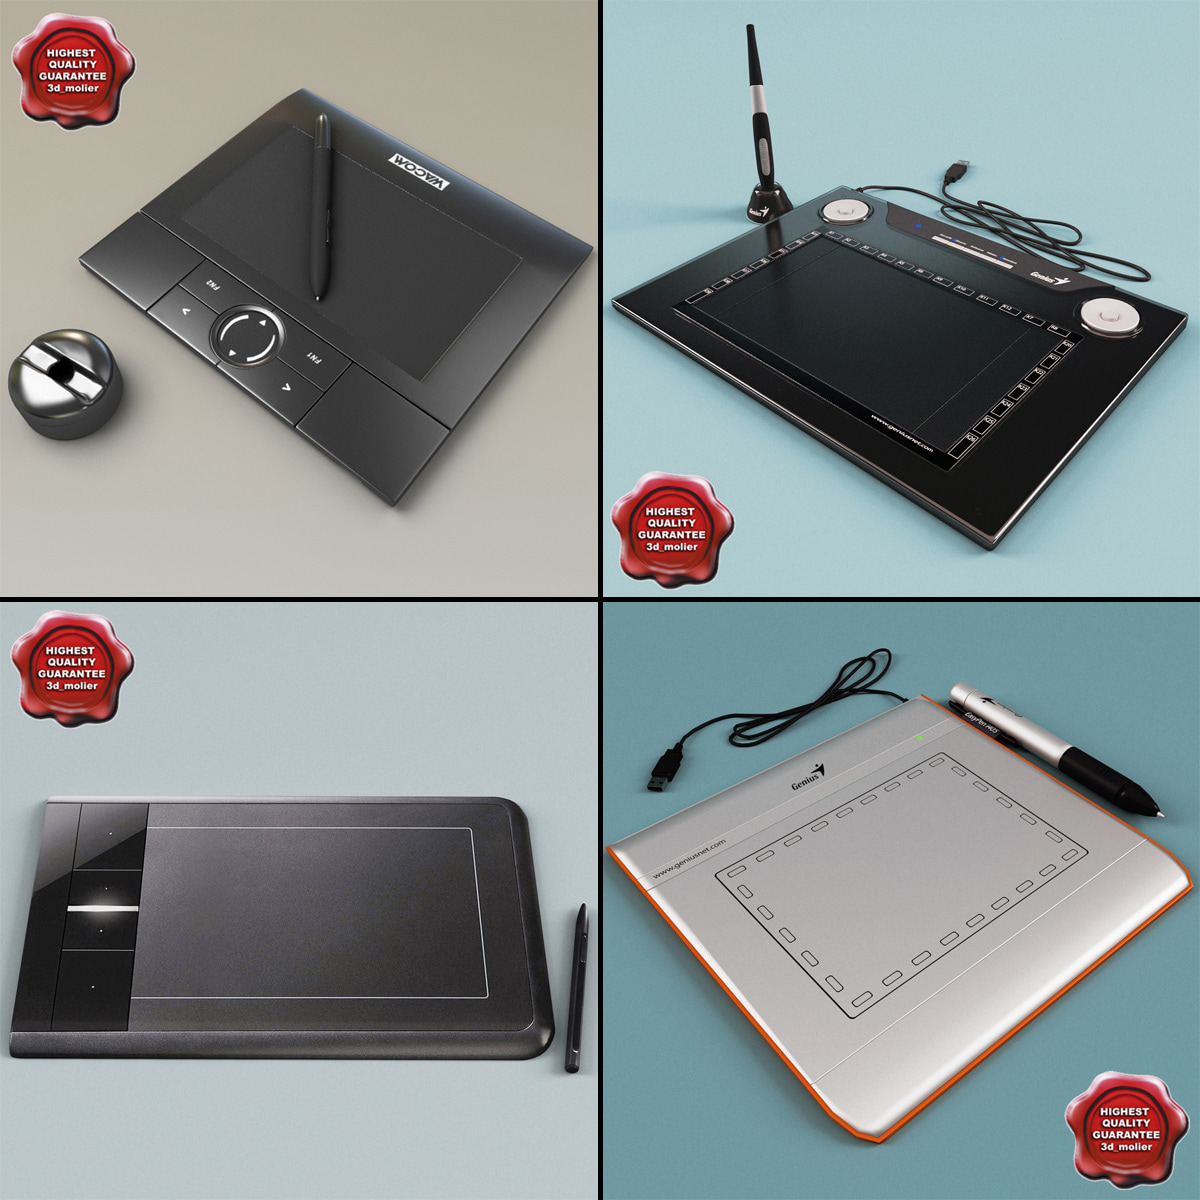 graphic tablets c4d